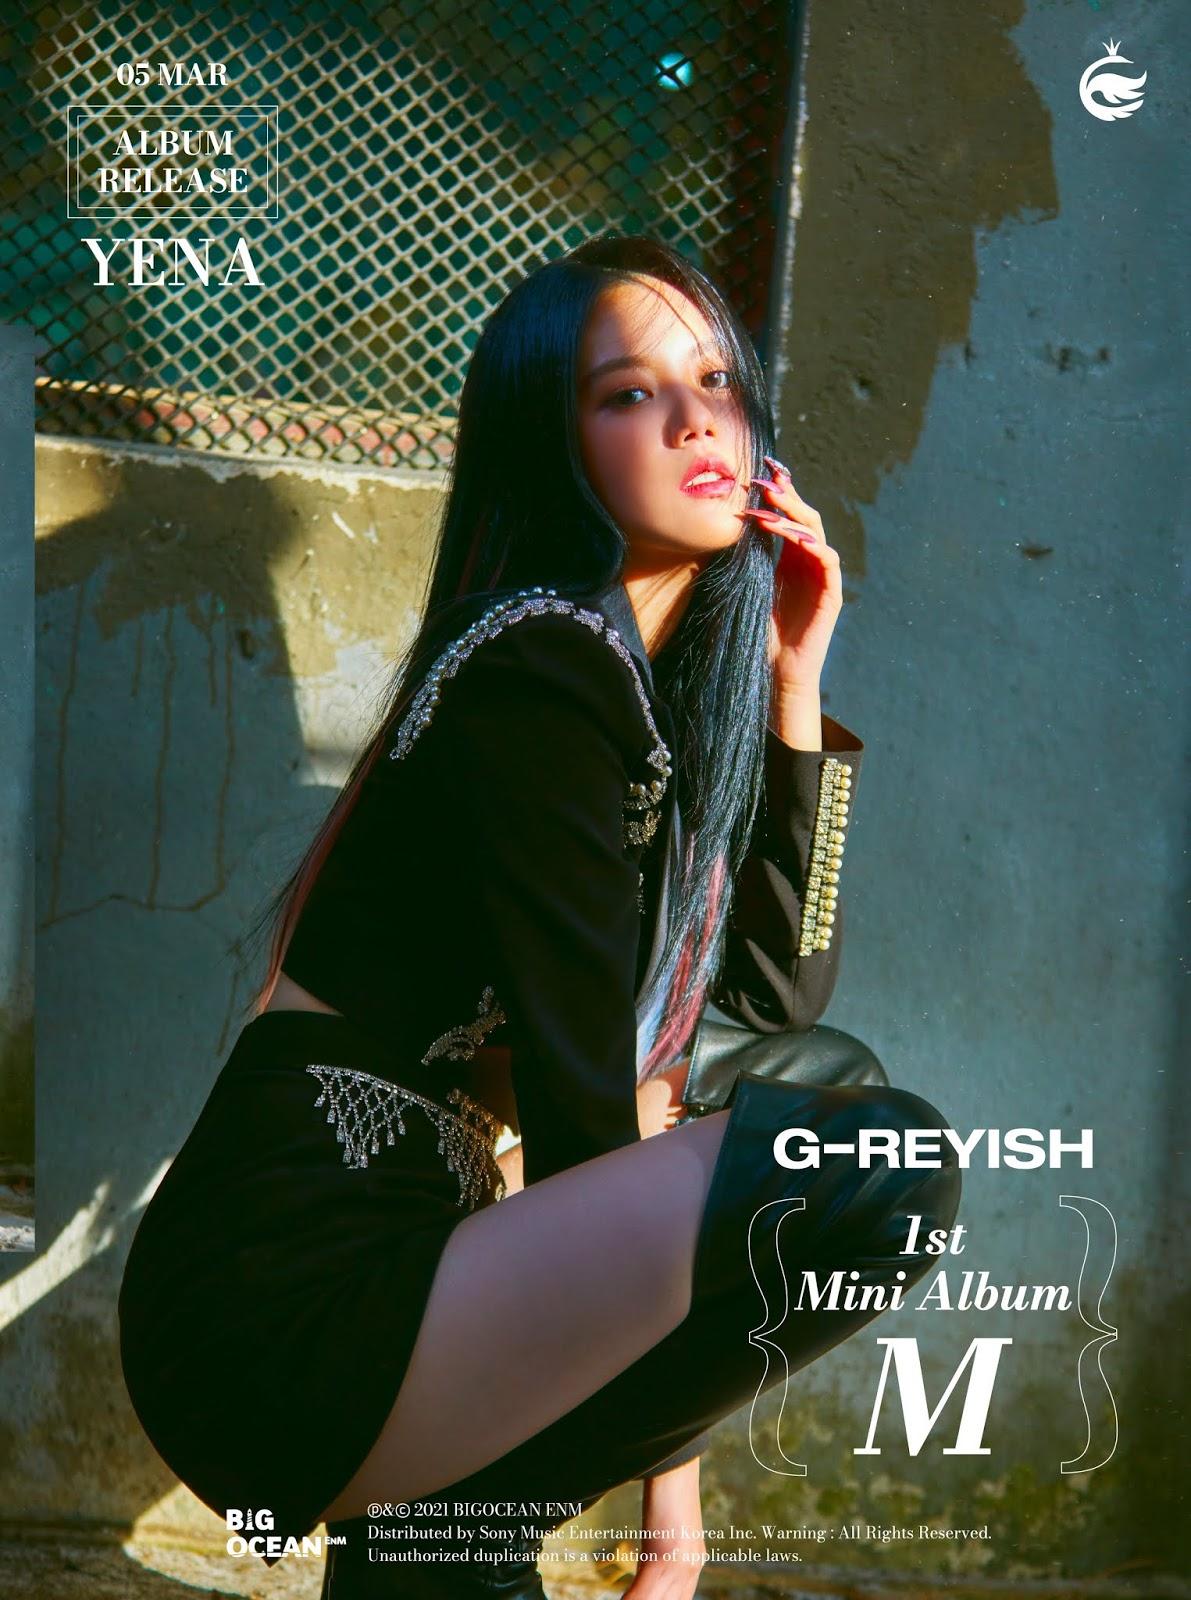 g-reyish m comeback yena